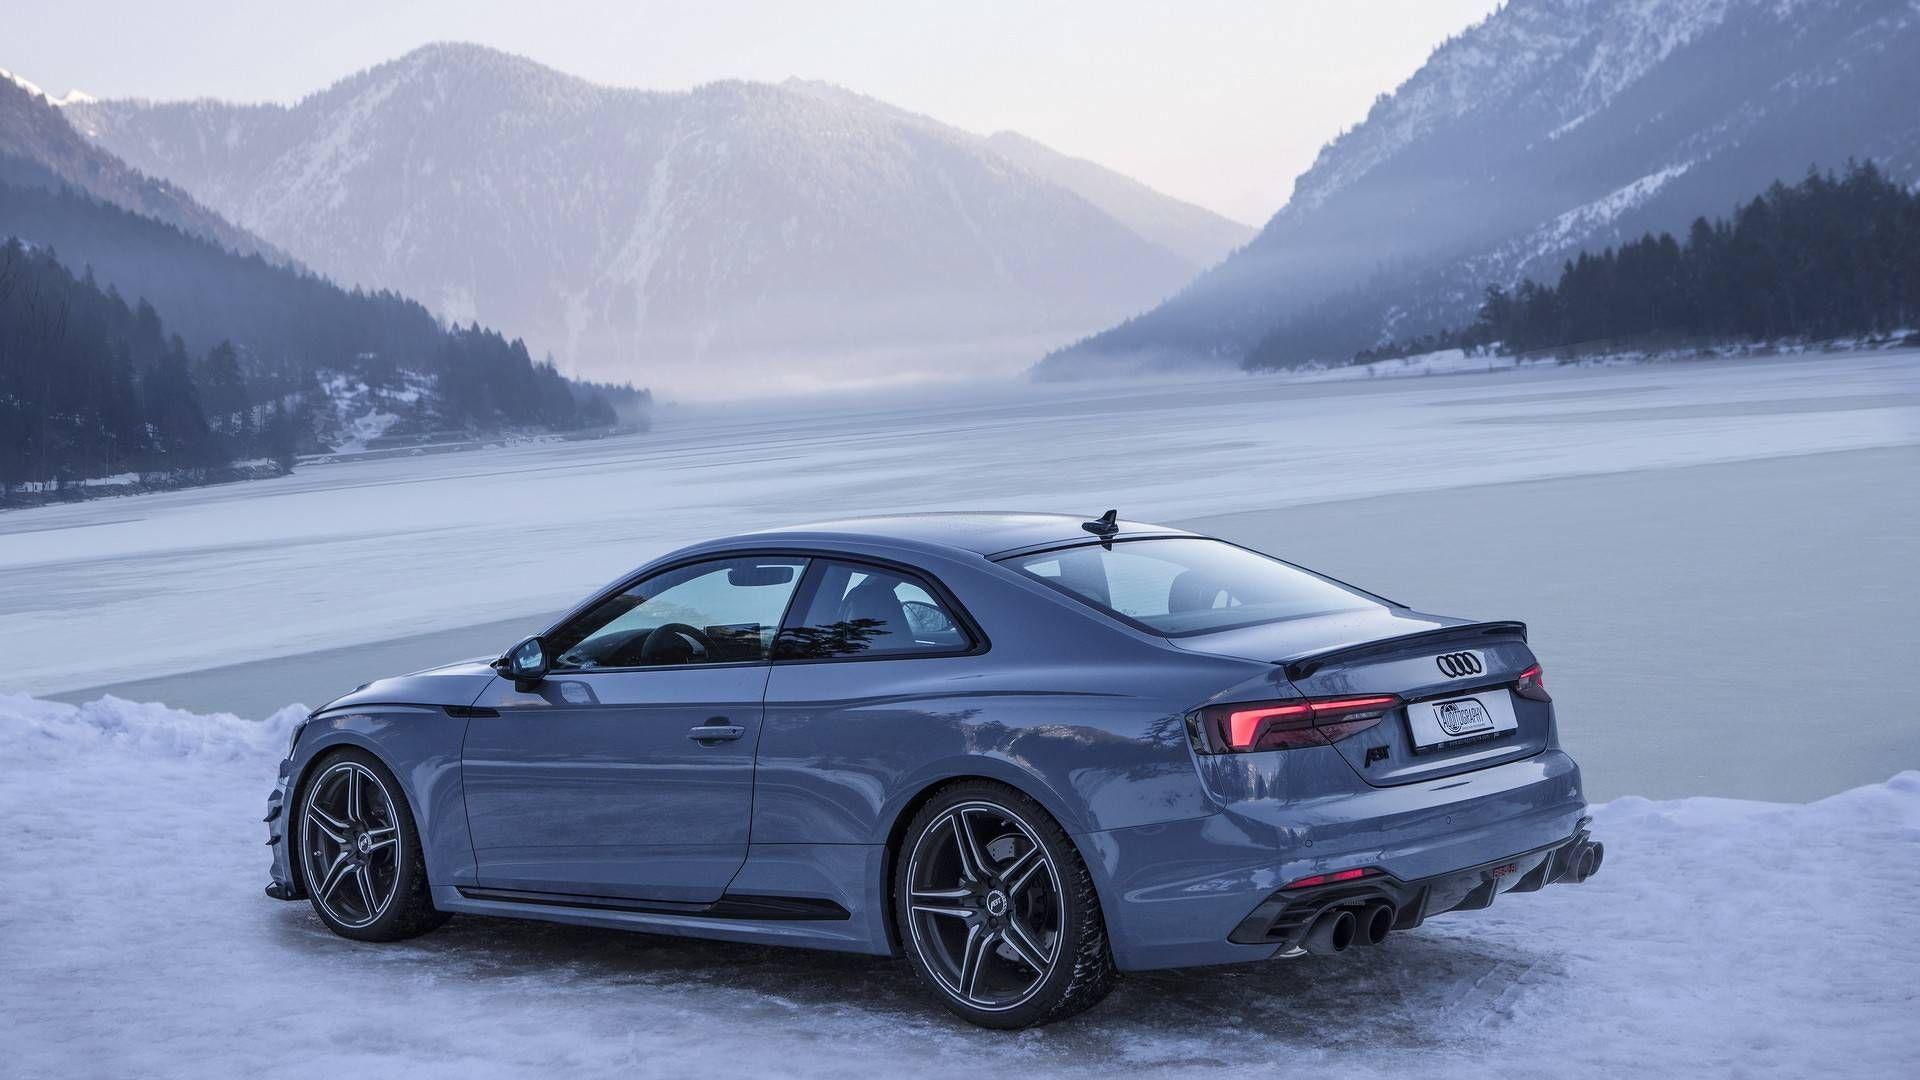 Abt Audi Rs5 покоряет Альпы Auto24